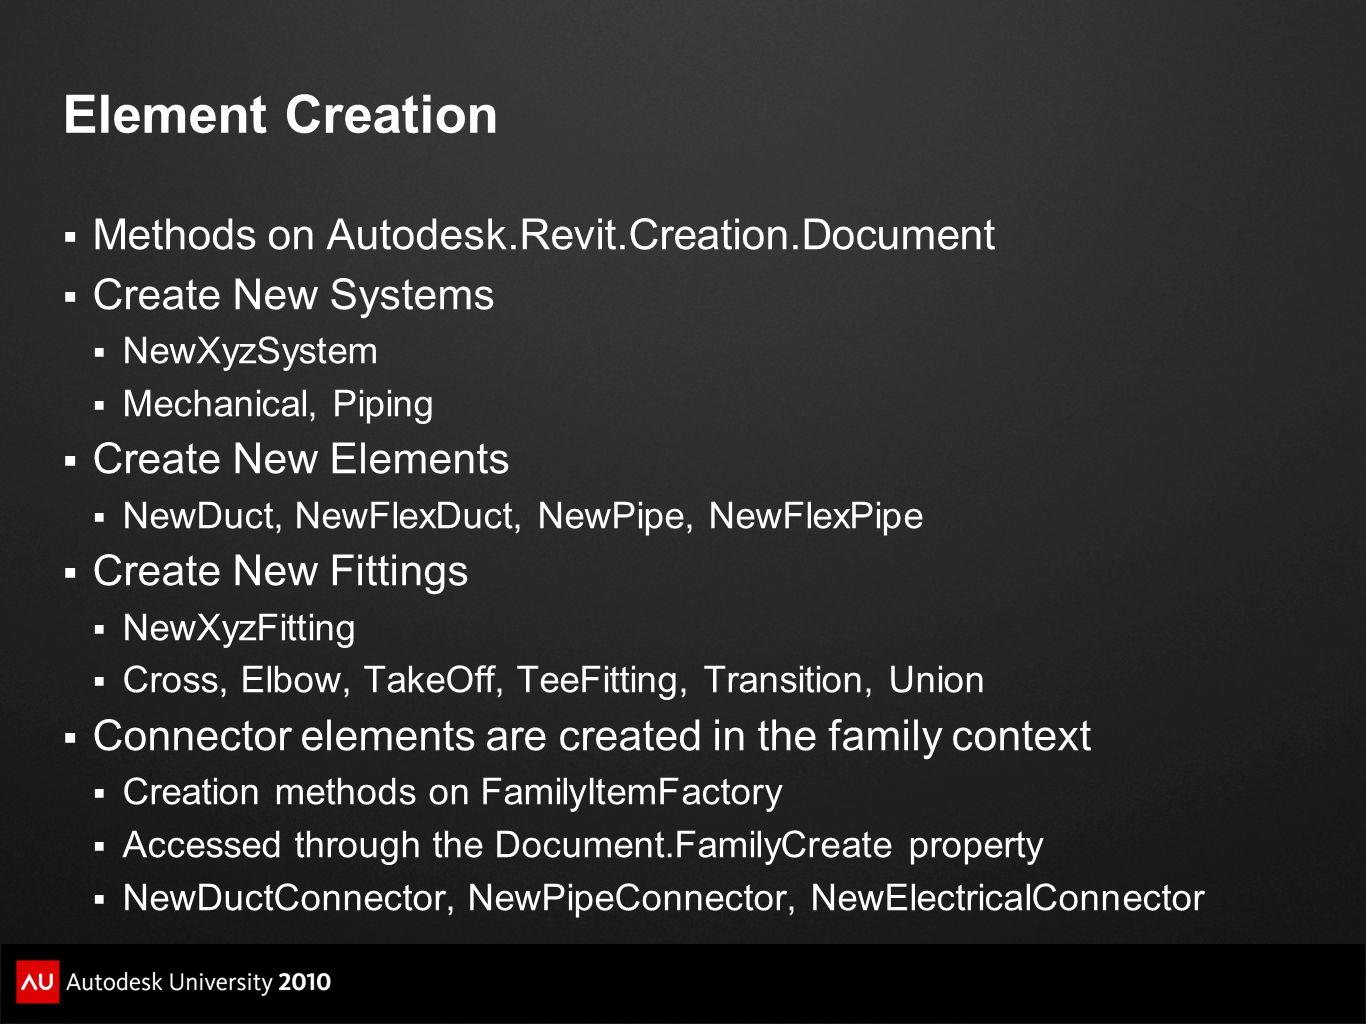 Element Creation Methods on Autodesk.Revit.Creation.Document